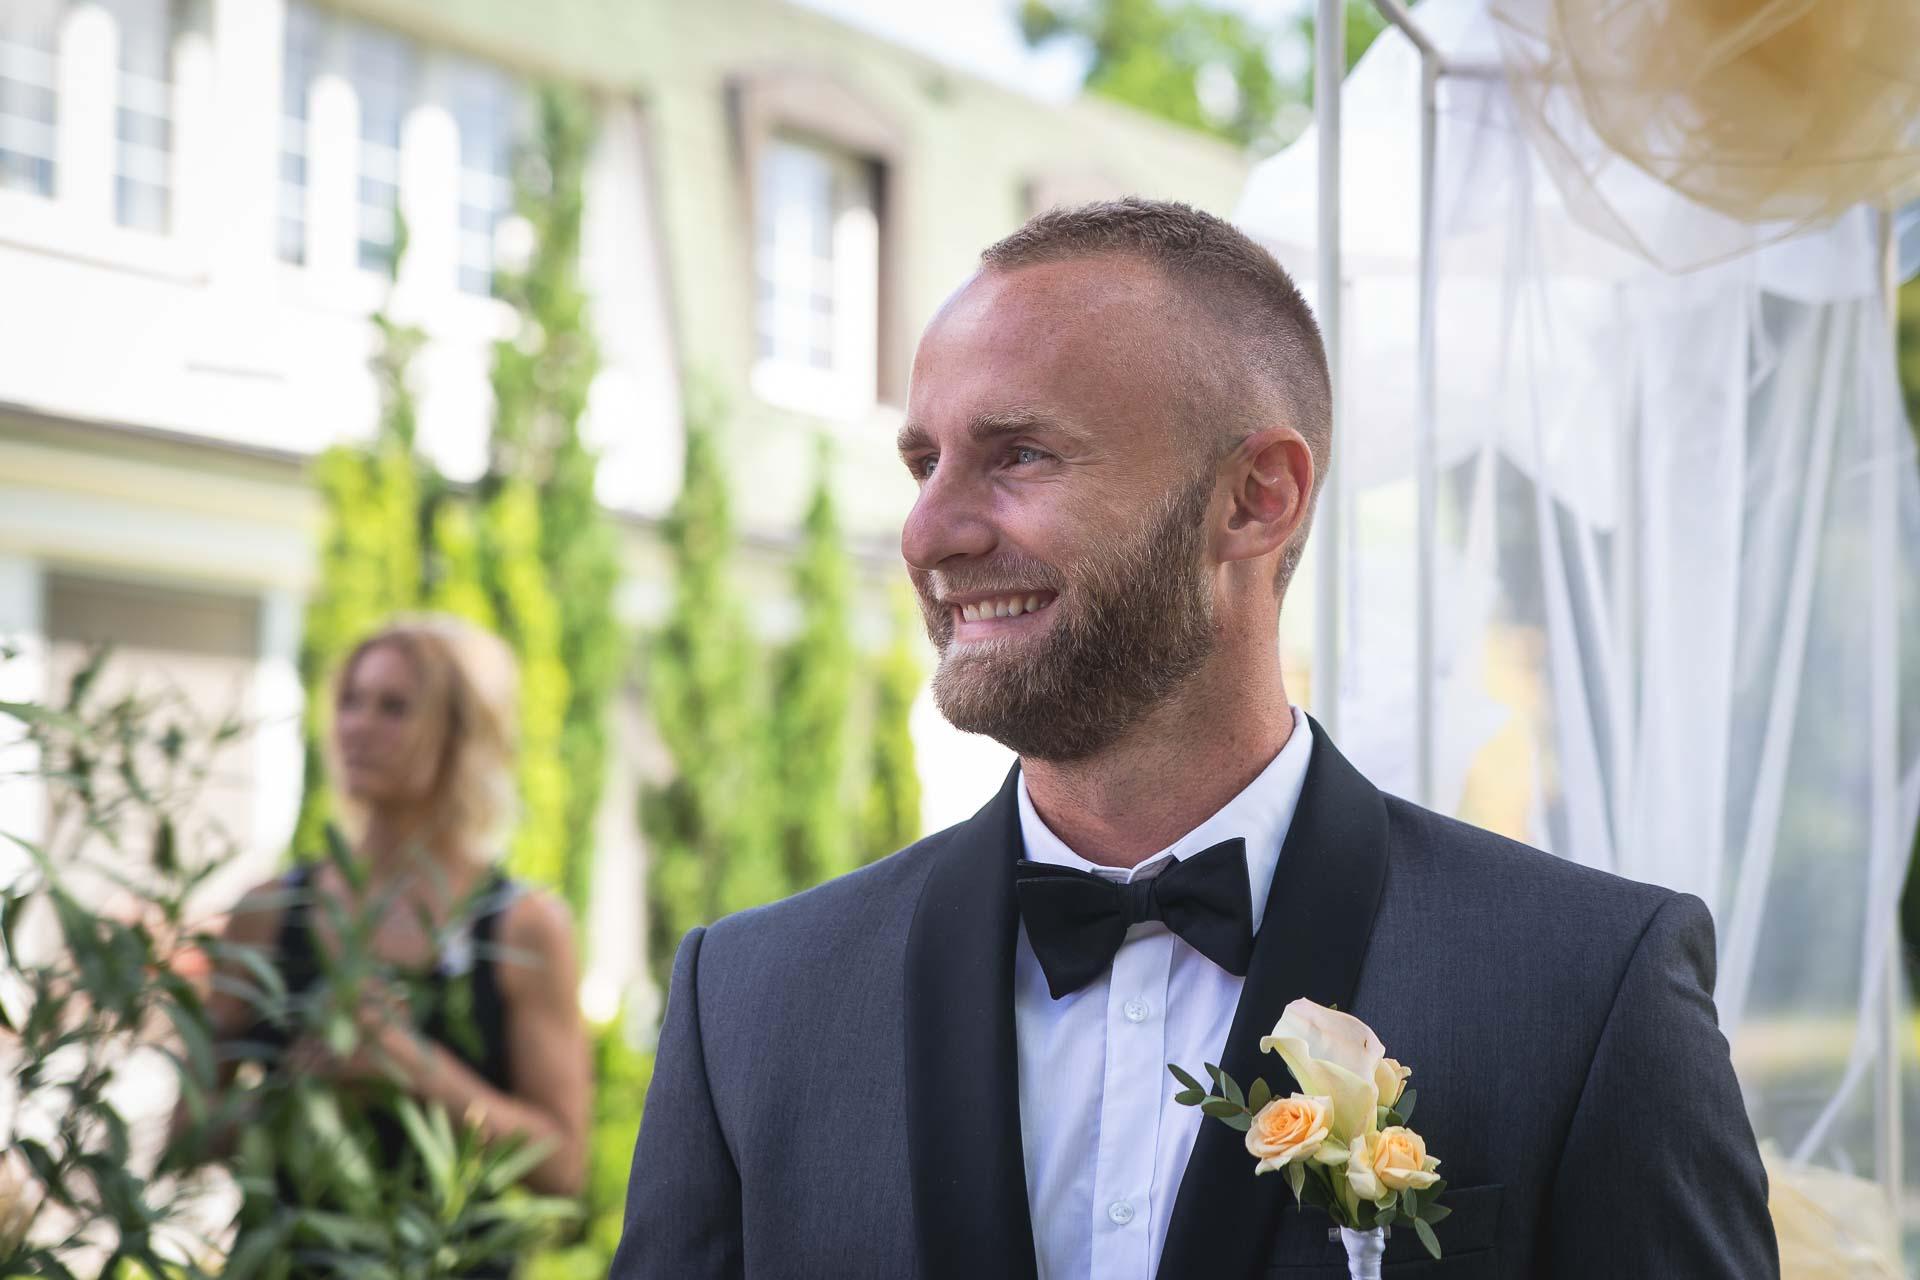 svatební-fotograf-svatebni-video-Nymburk-hotel-Ostrov-Beautyfoto-5094